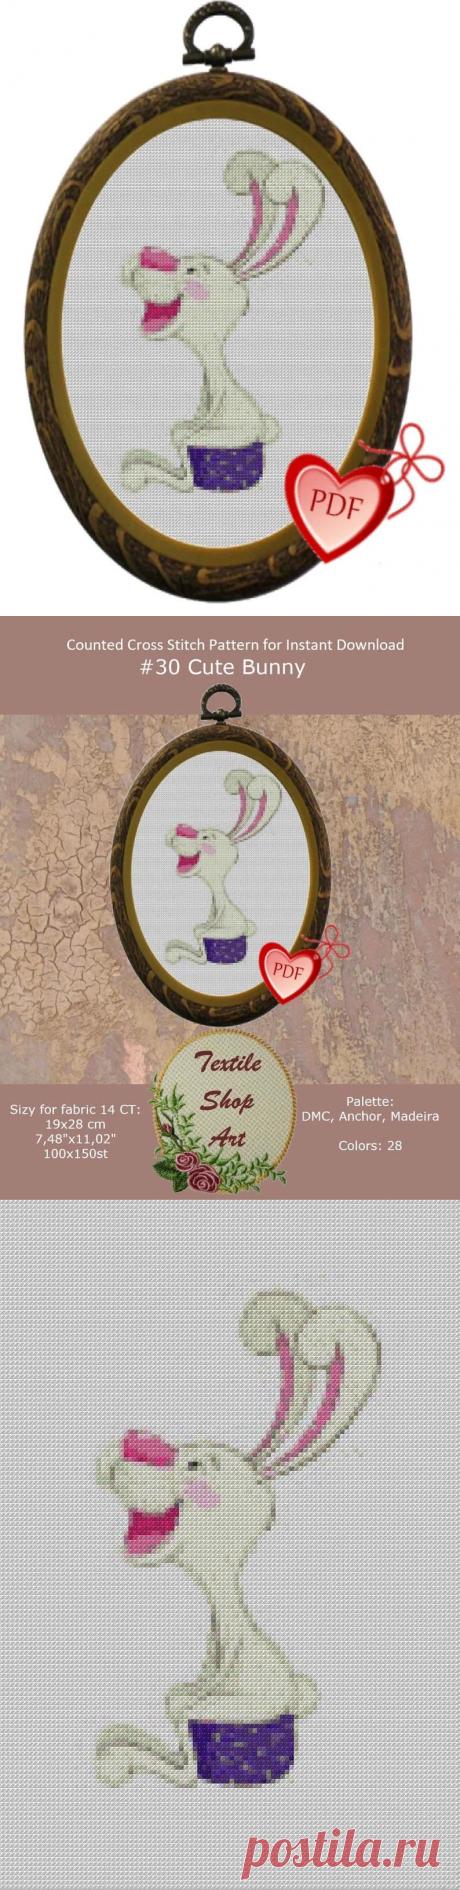 Cute Bunny Cross Stitch Pattern Cross Stitch for Beginners | Etsy